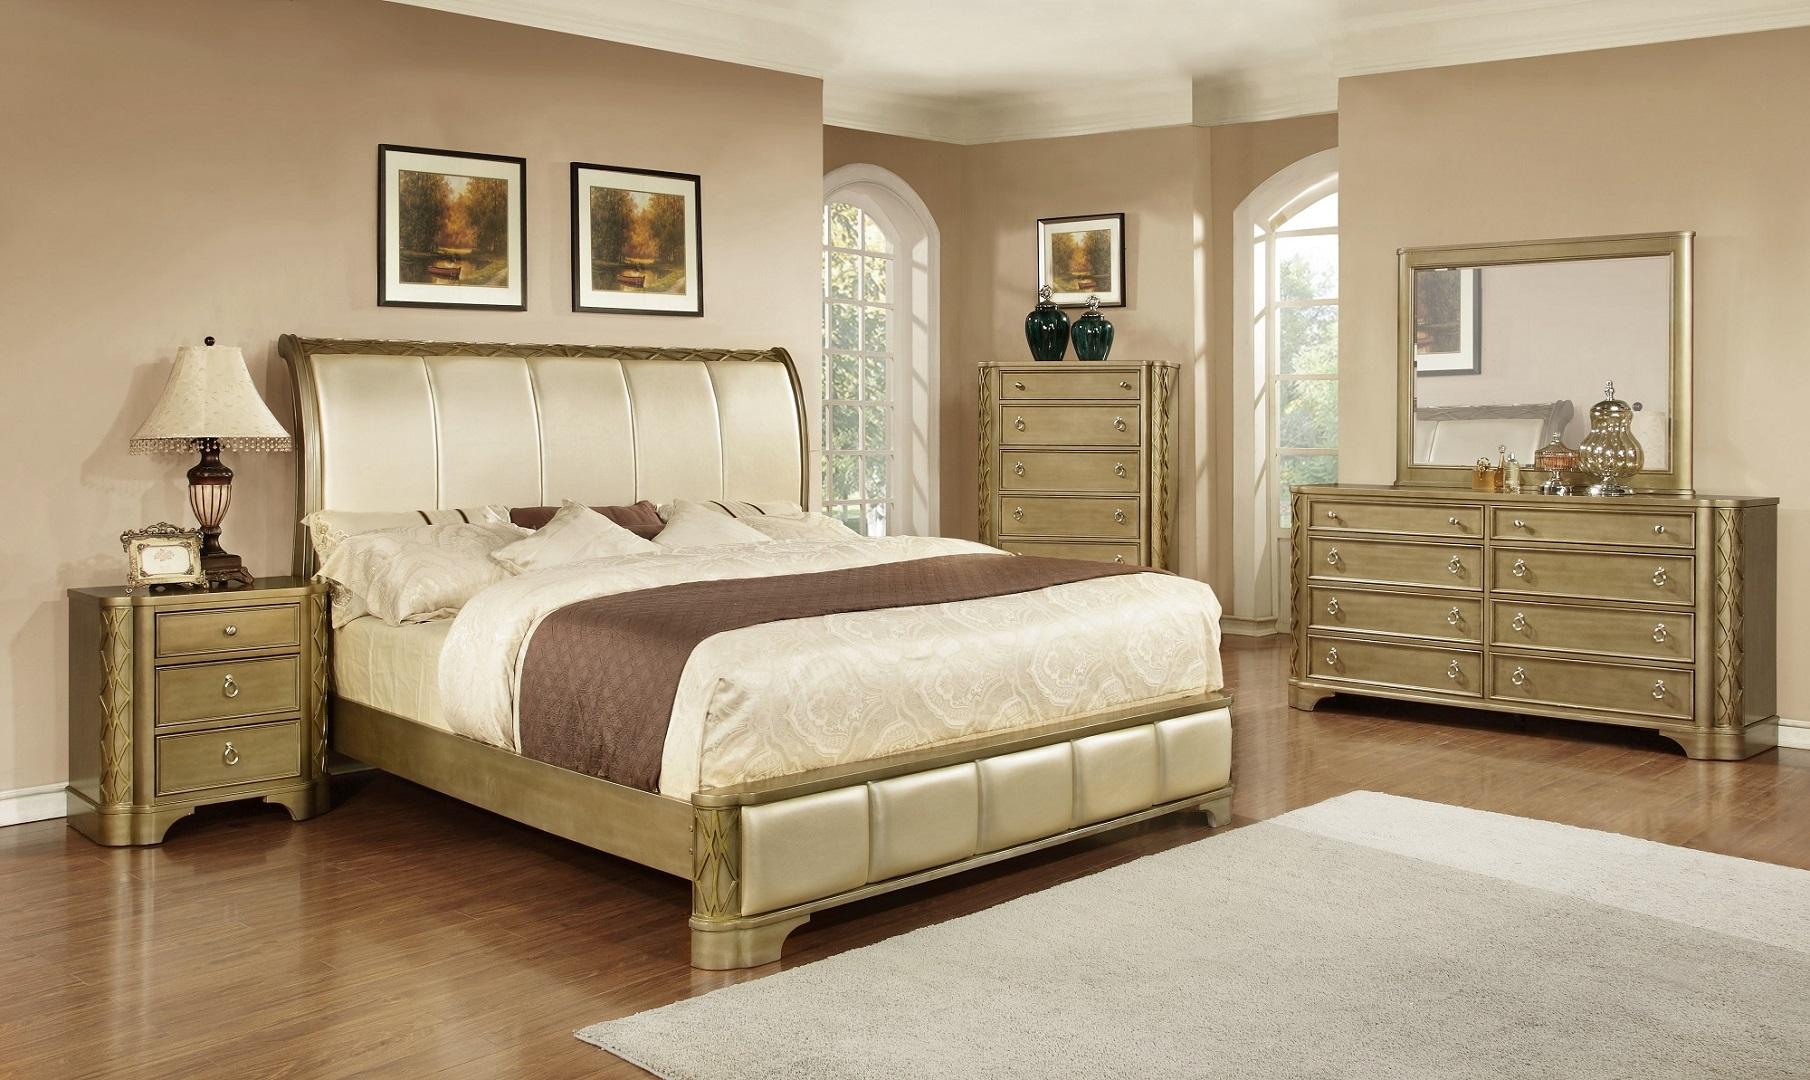 GL2909 Milan Bedroom Set